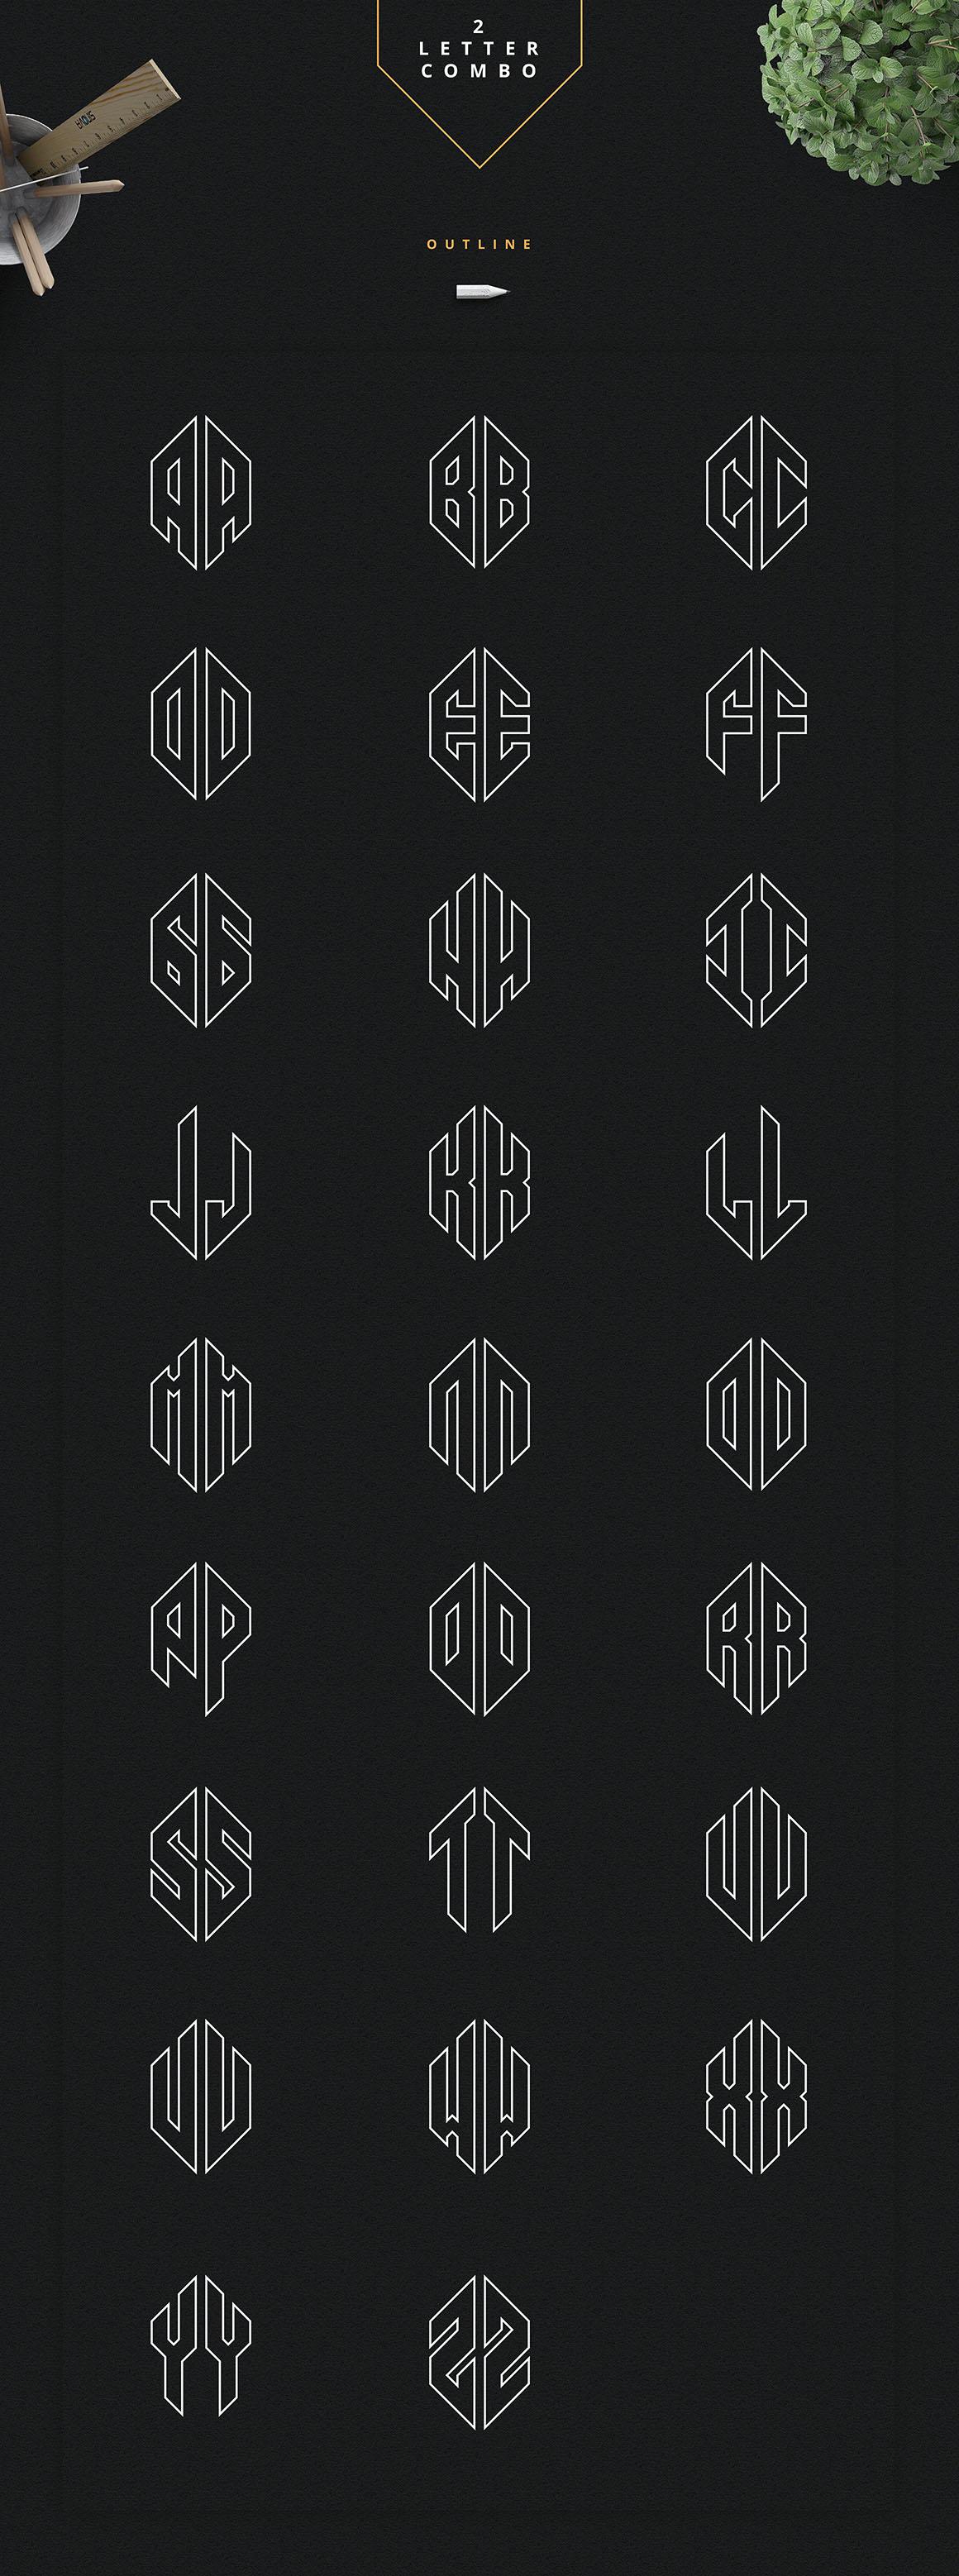 6in1-Ultimate-Monogram-creator-06.jpg